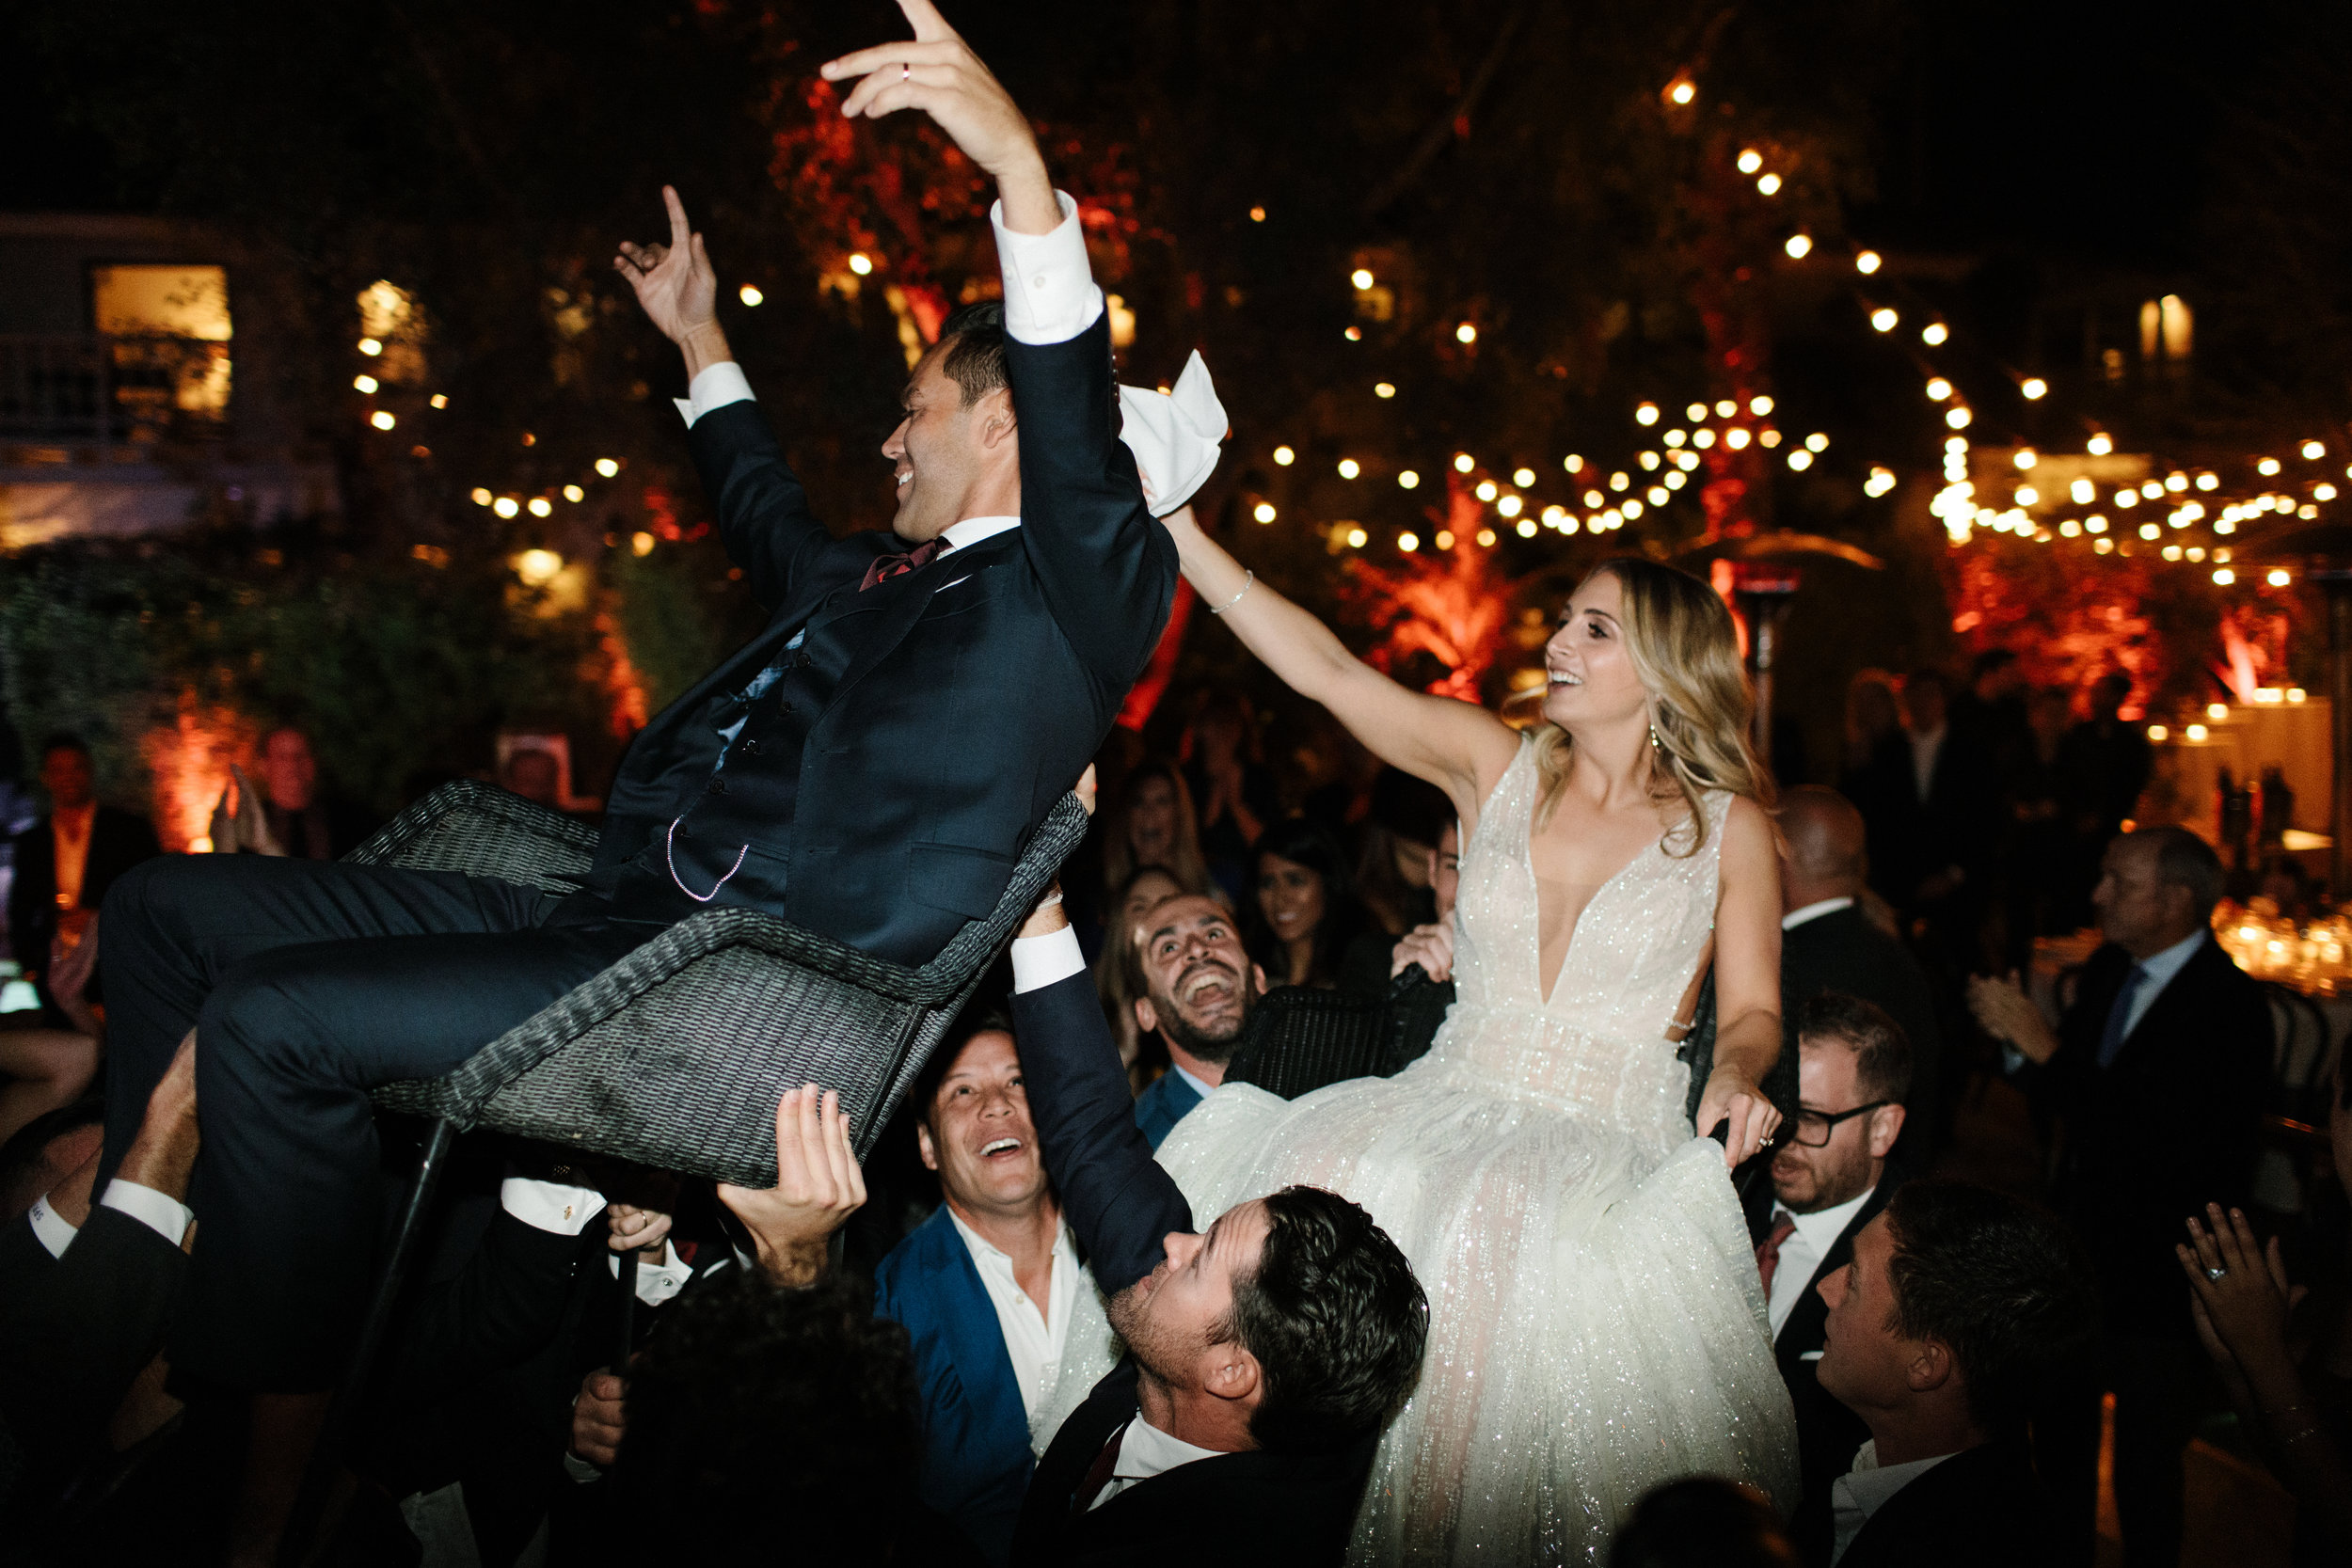 Dara_&_Garrett_Colony_Palms_Hotel_Wedding_Photos-536.jpg